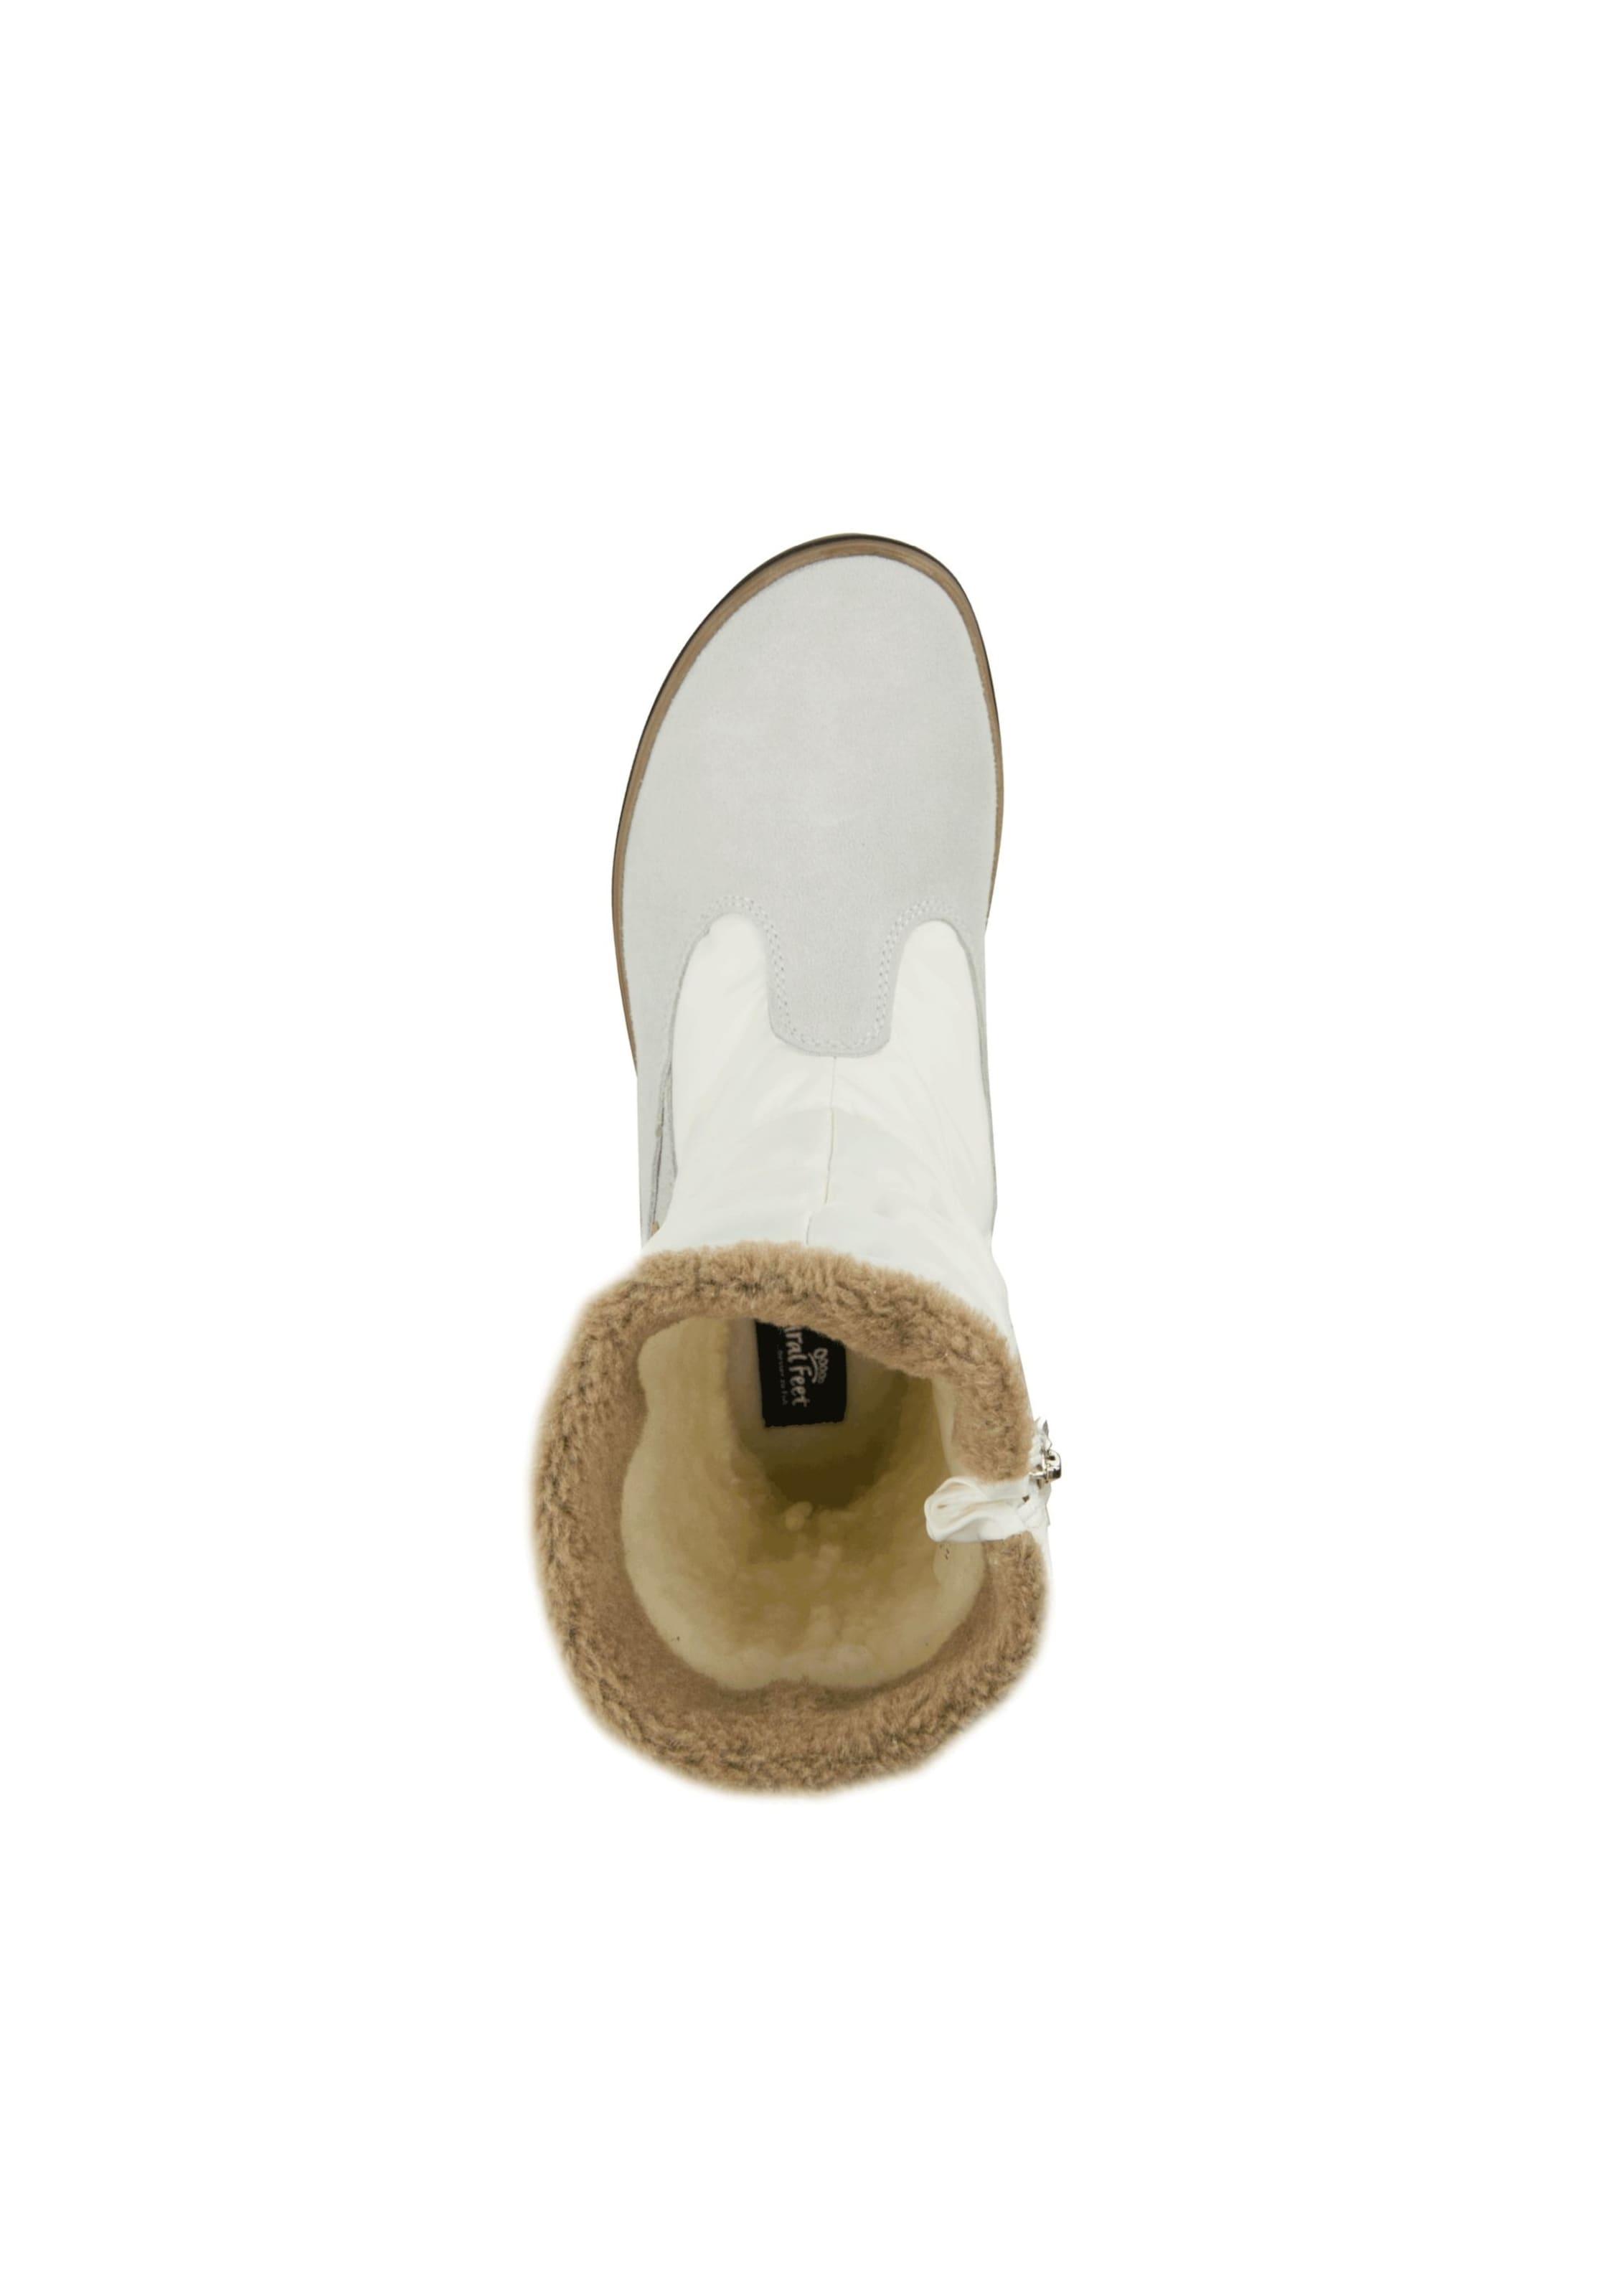 Winterstiefel 'aneira' Weiß EcruHellgrau Natural In Feet 5A34RLj